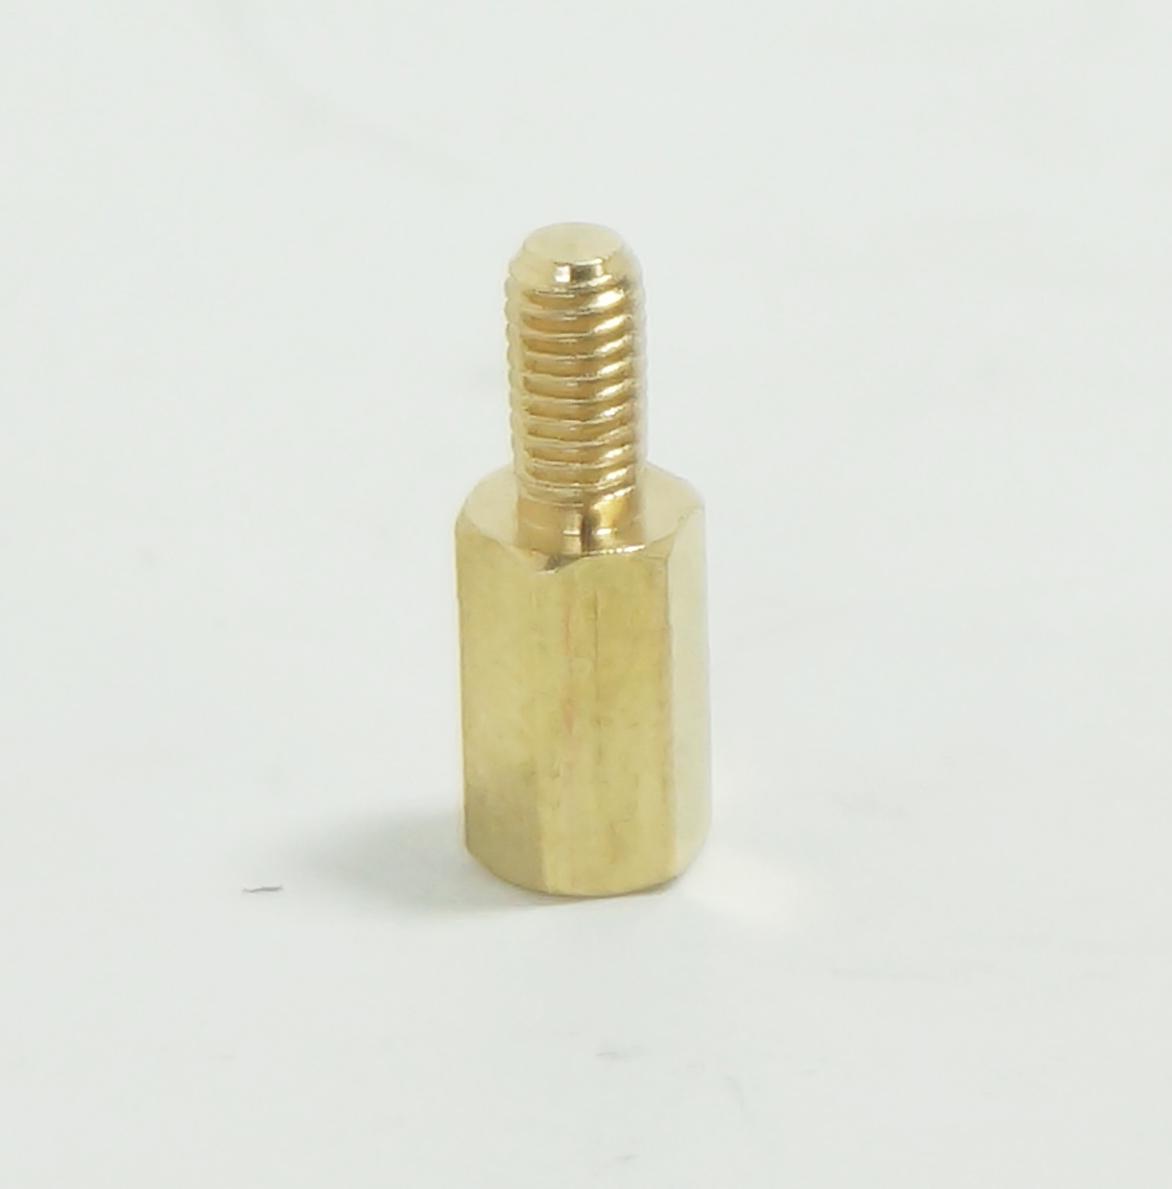 M3x8mm Female to Male PCB Standoff